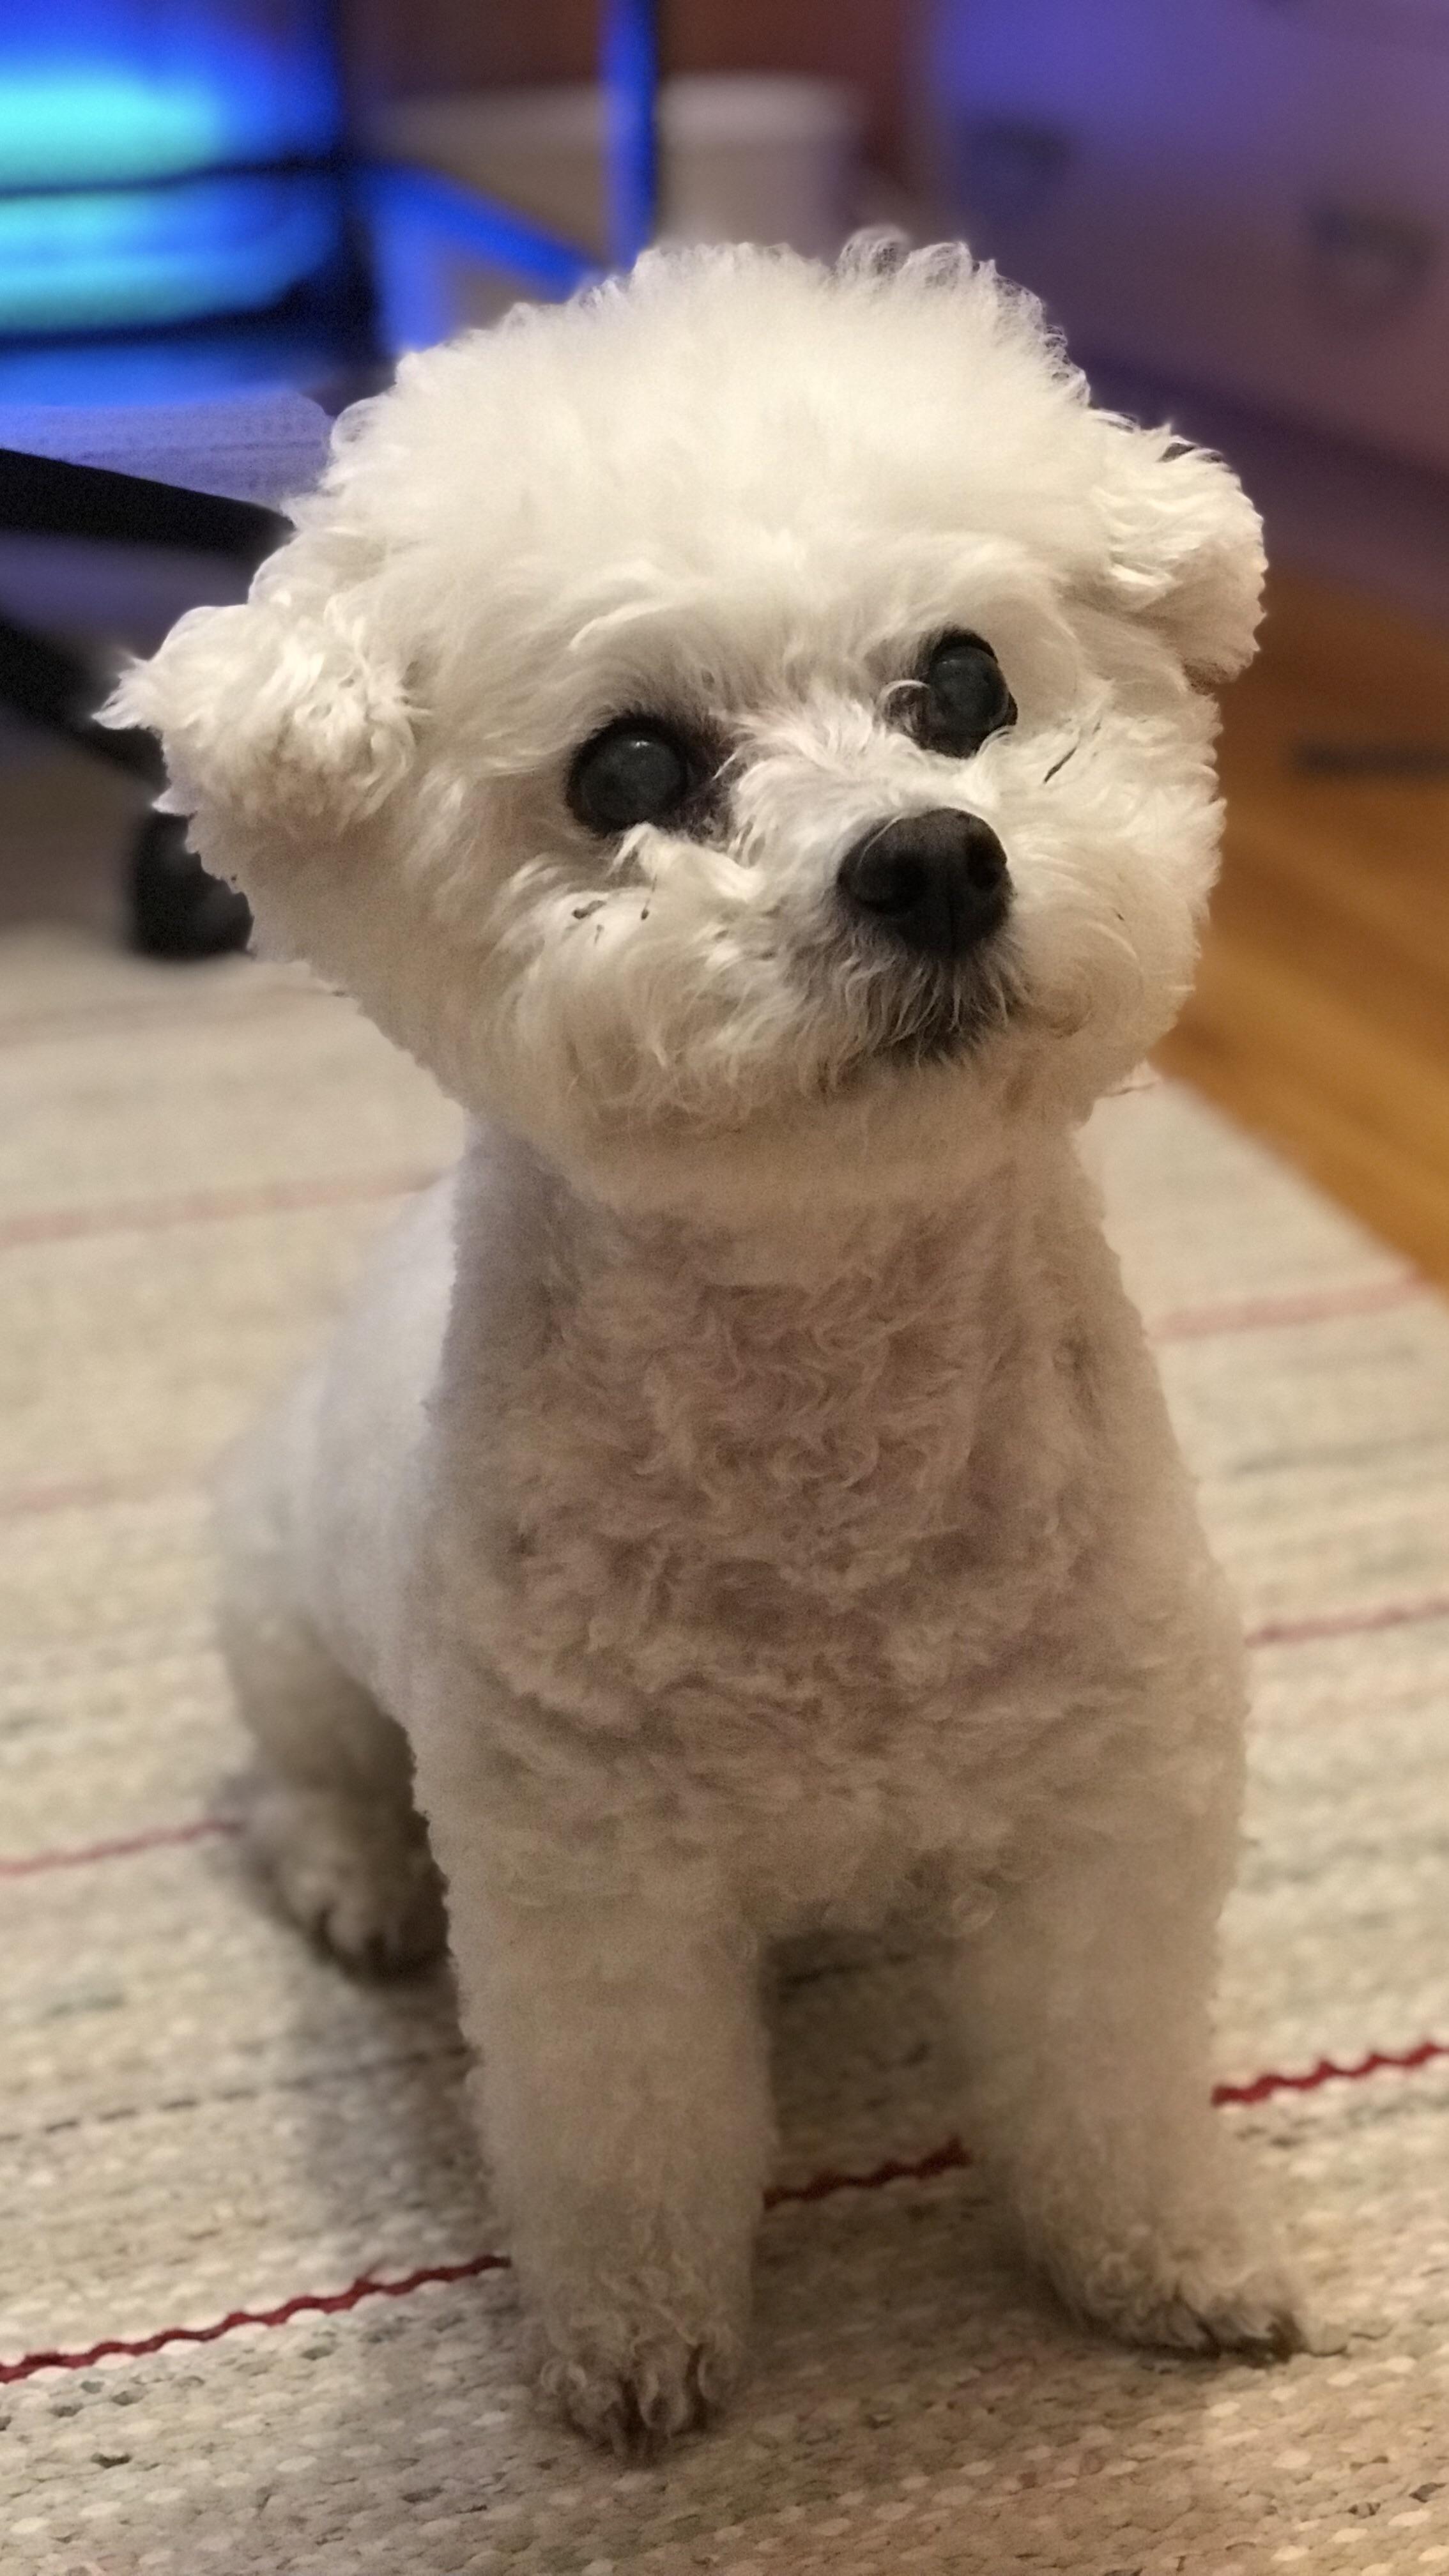 My 14 Year Old Bichon Frisehttps I Redd It El30auy7q5k01 Jpg Bichon Frise Boxer Dogs Pitbull Puppies